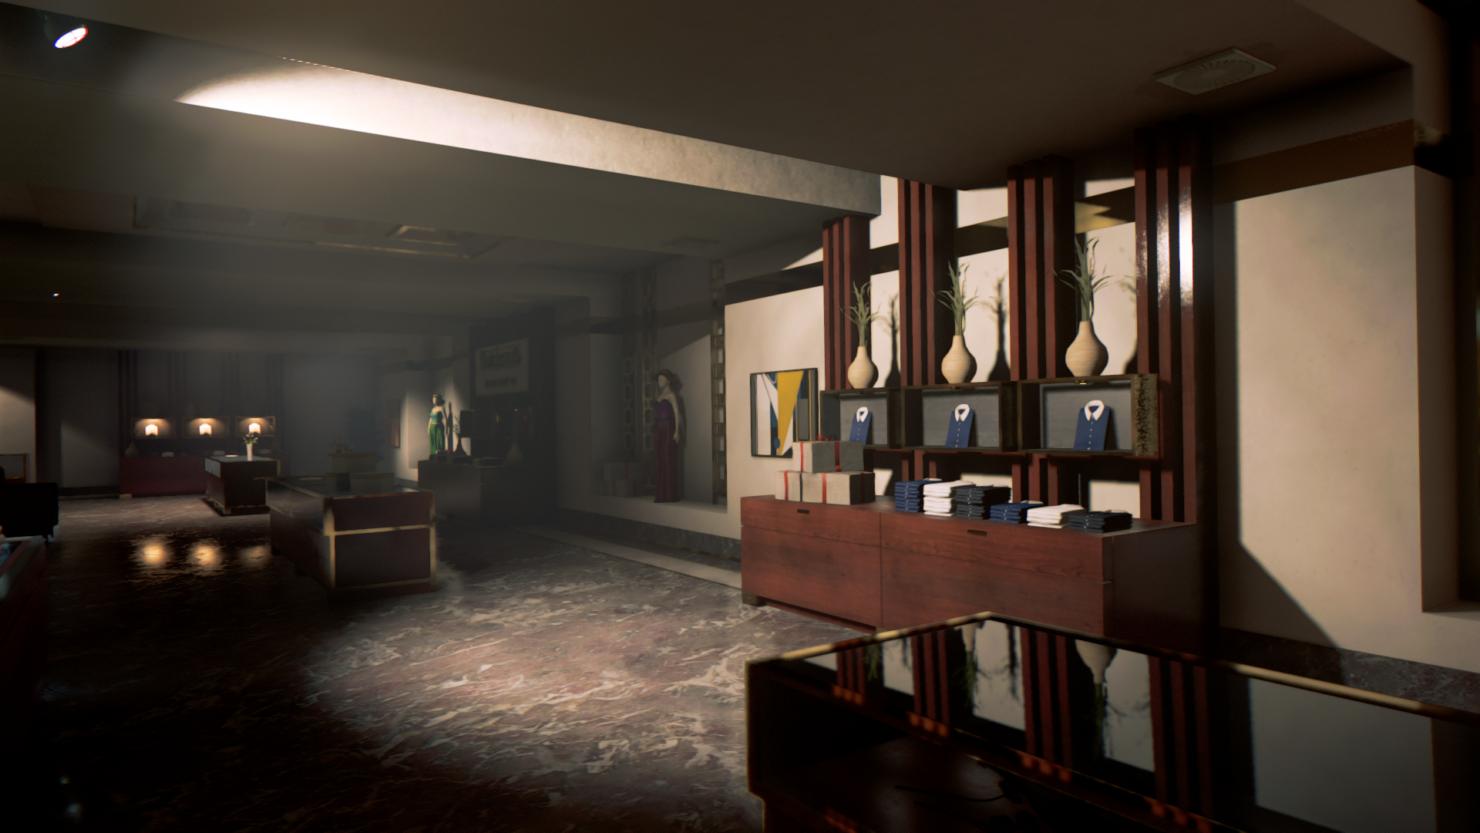 mafia3_dlc2_stones_unturned_screenshot_07_environment_boicherots_department_store_interior_dark